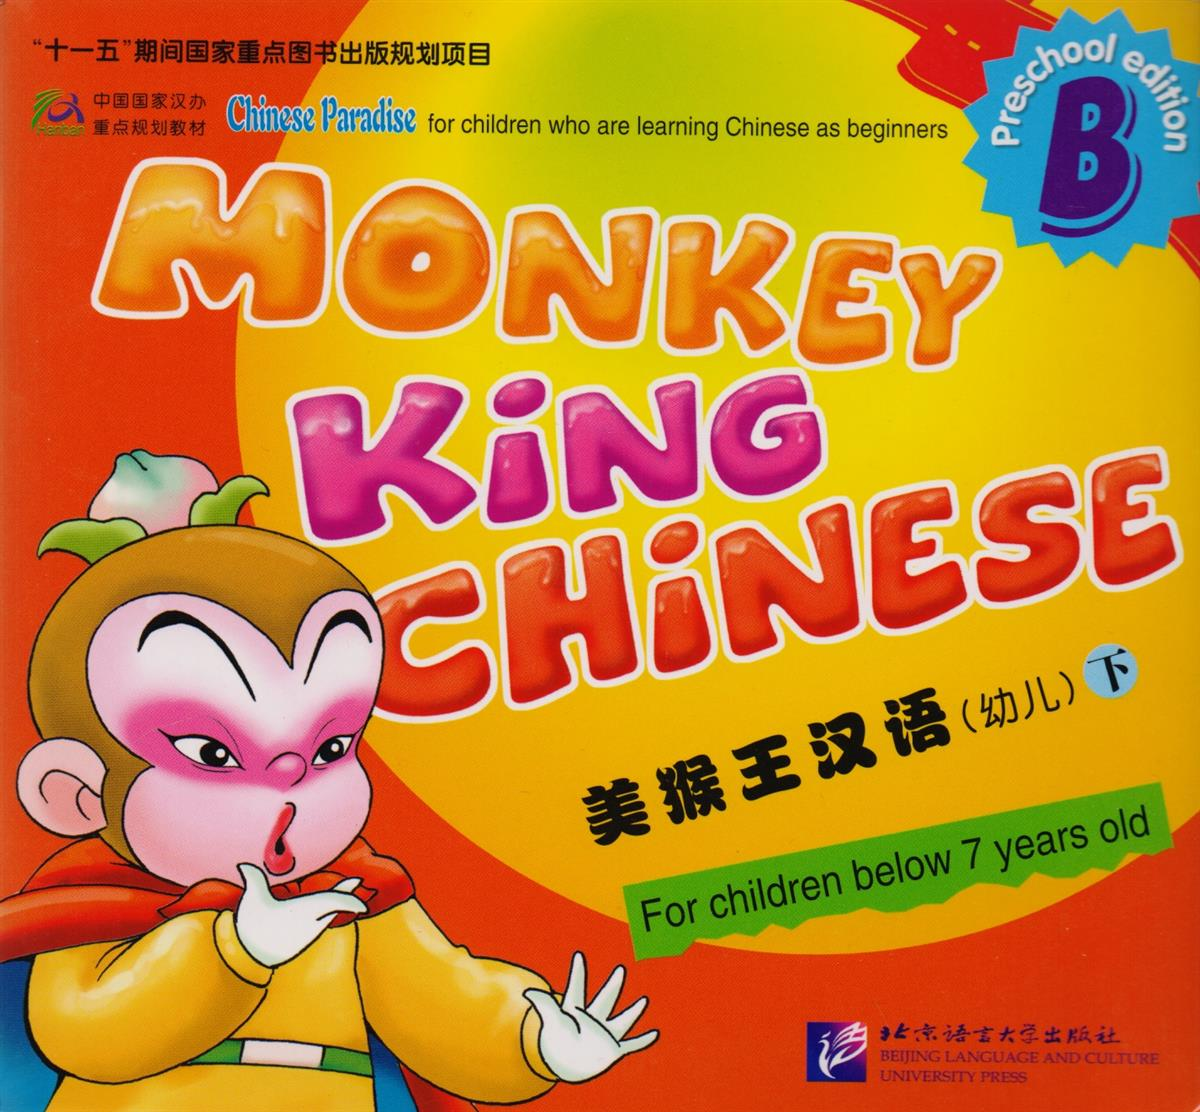 Liu Fuhua, Wang Wei, Zhou Ruia Monkey King Chinese. Part B / Учим китайский с королем обезьян для дошкольников. Часть B (книга на китайском и английском языках) yamin ma easy steps to chinese 1 wb легкие шаги к китайскому часть 1 рабочая тетрадь на китайском и английском языках